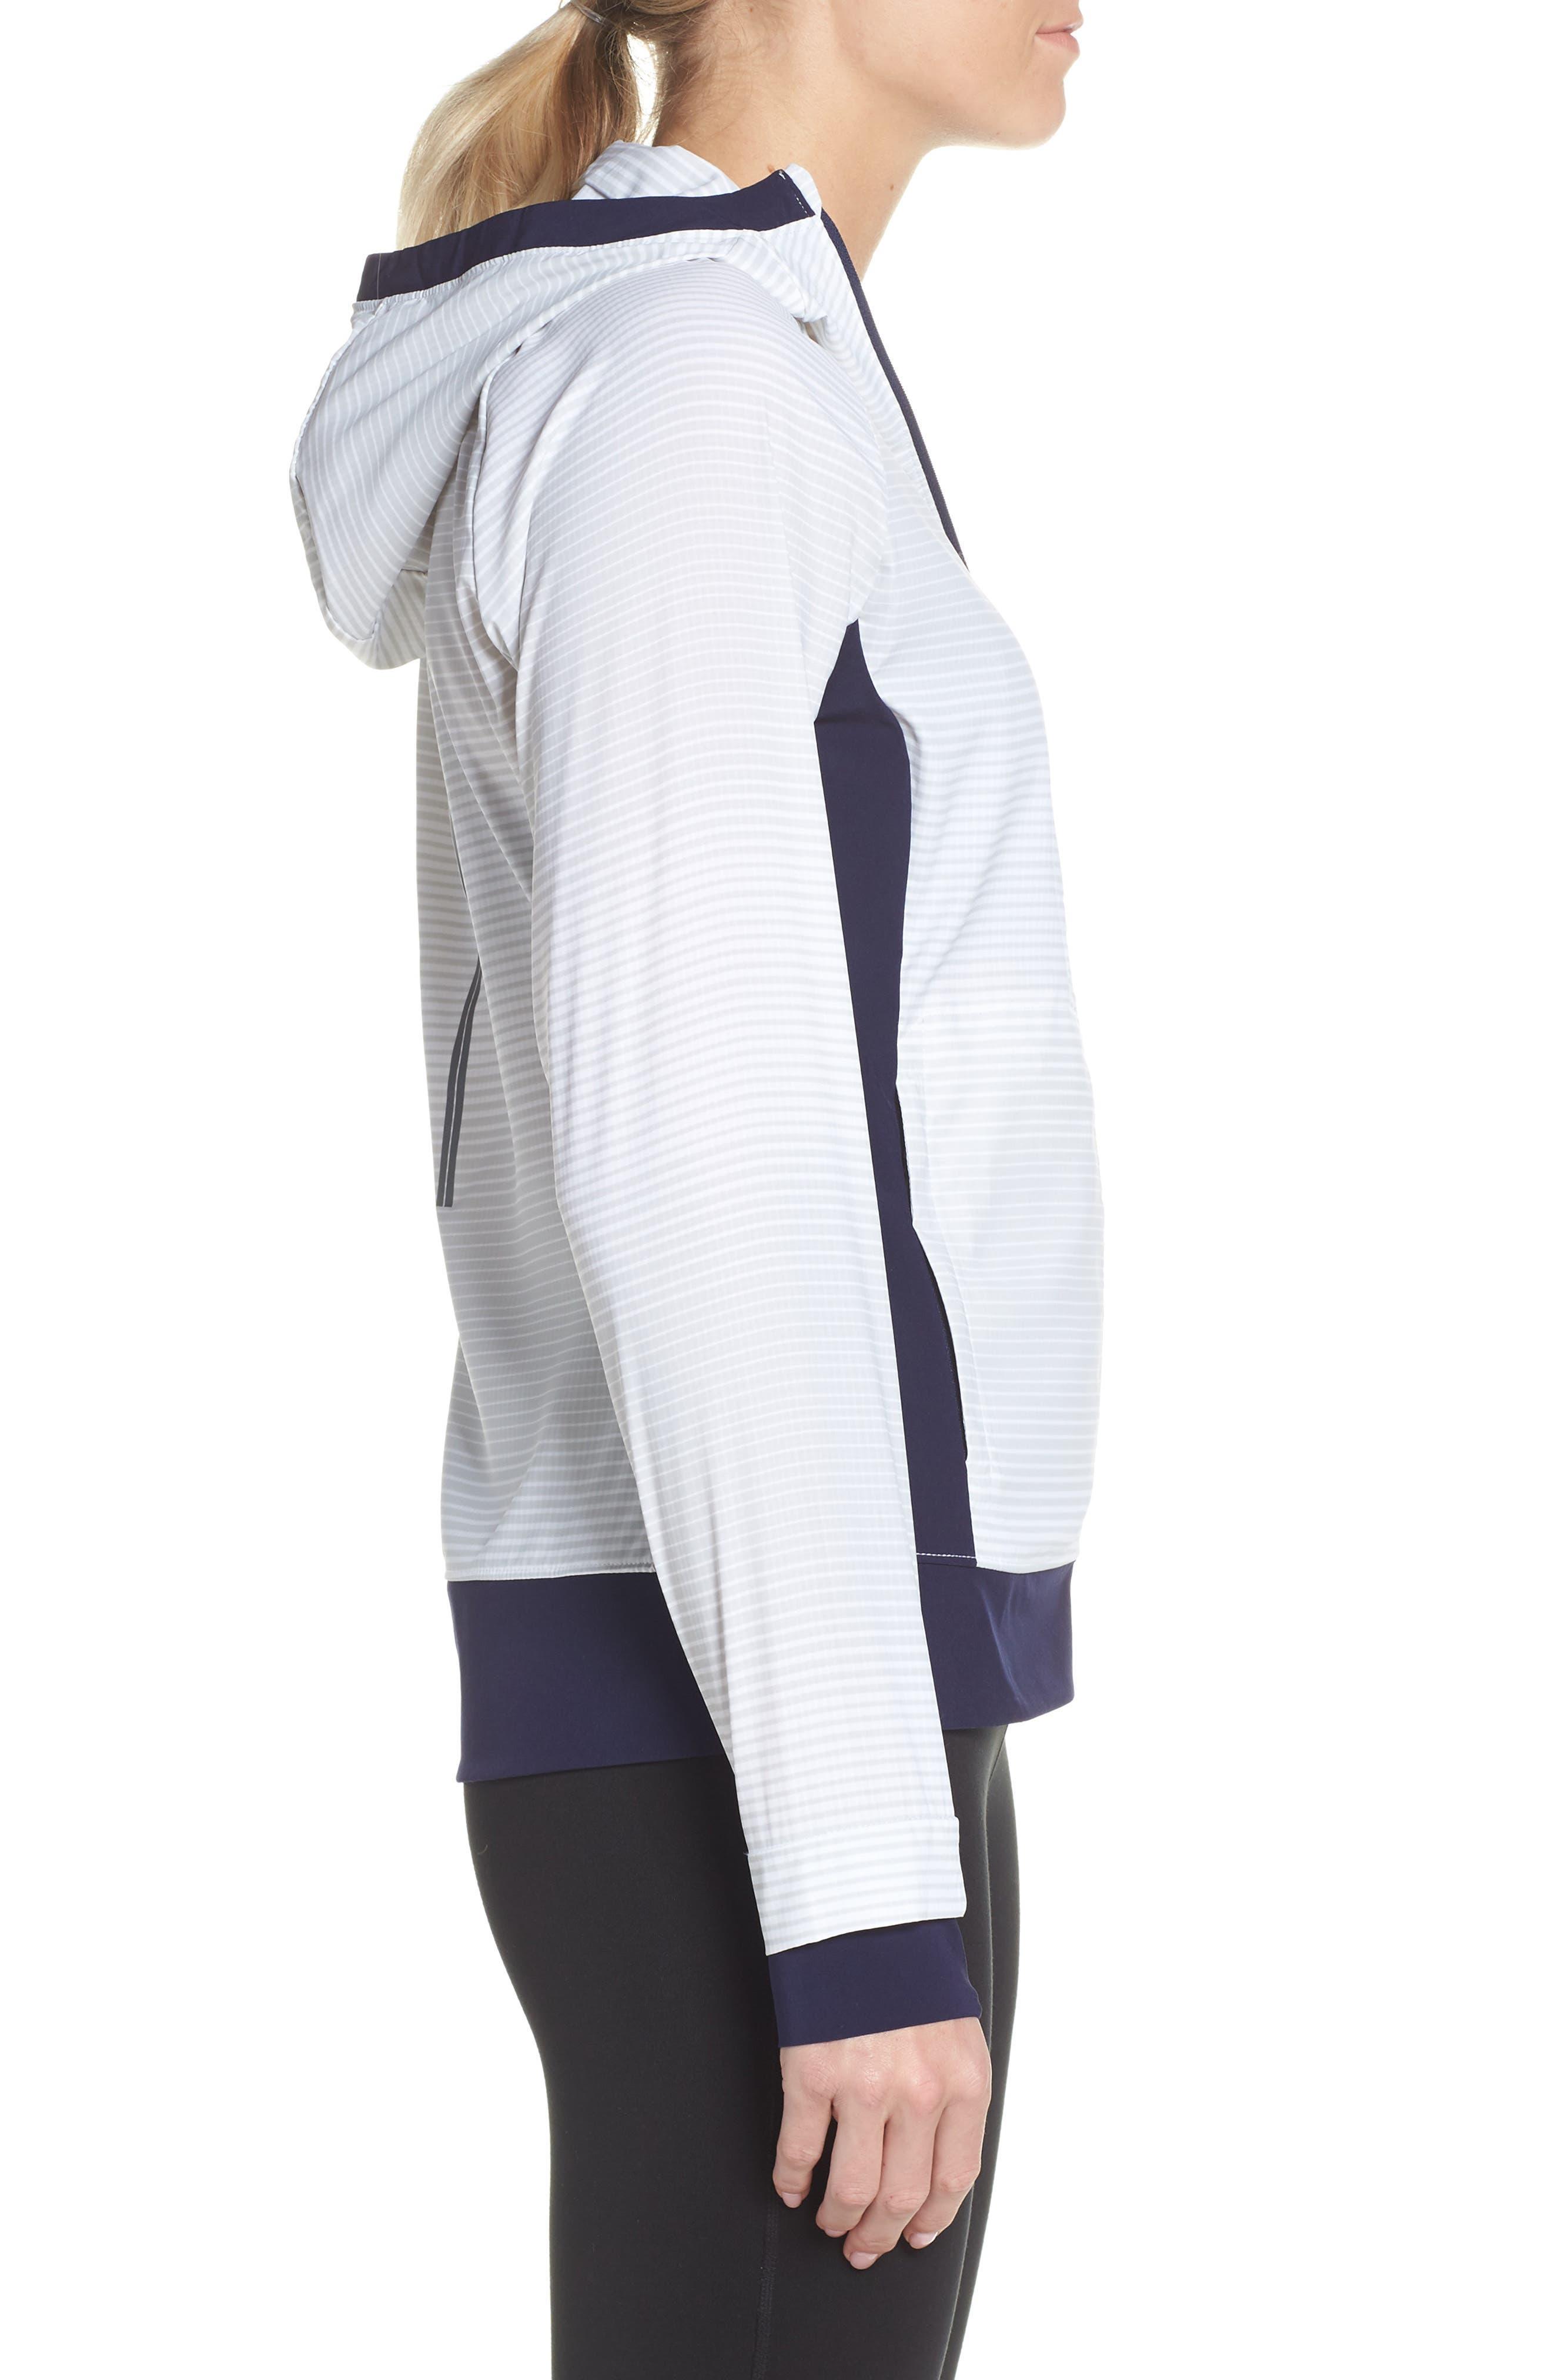 BROOKS, Canopy SE Reflective Running Jacket, Alternate thumbnail 4, color, 406